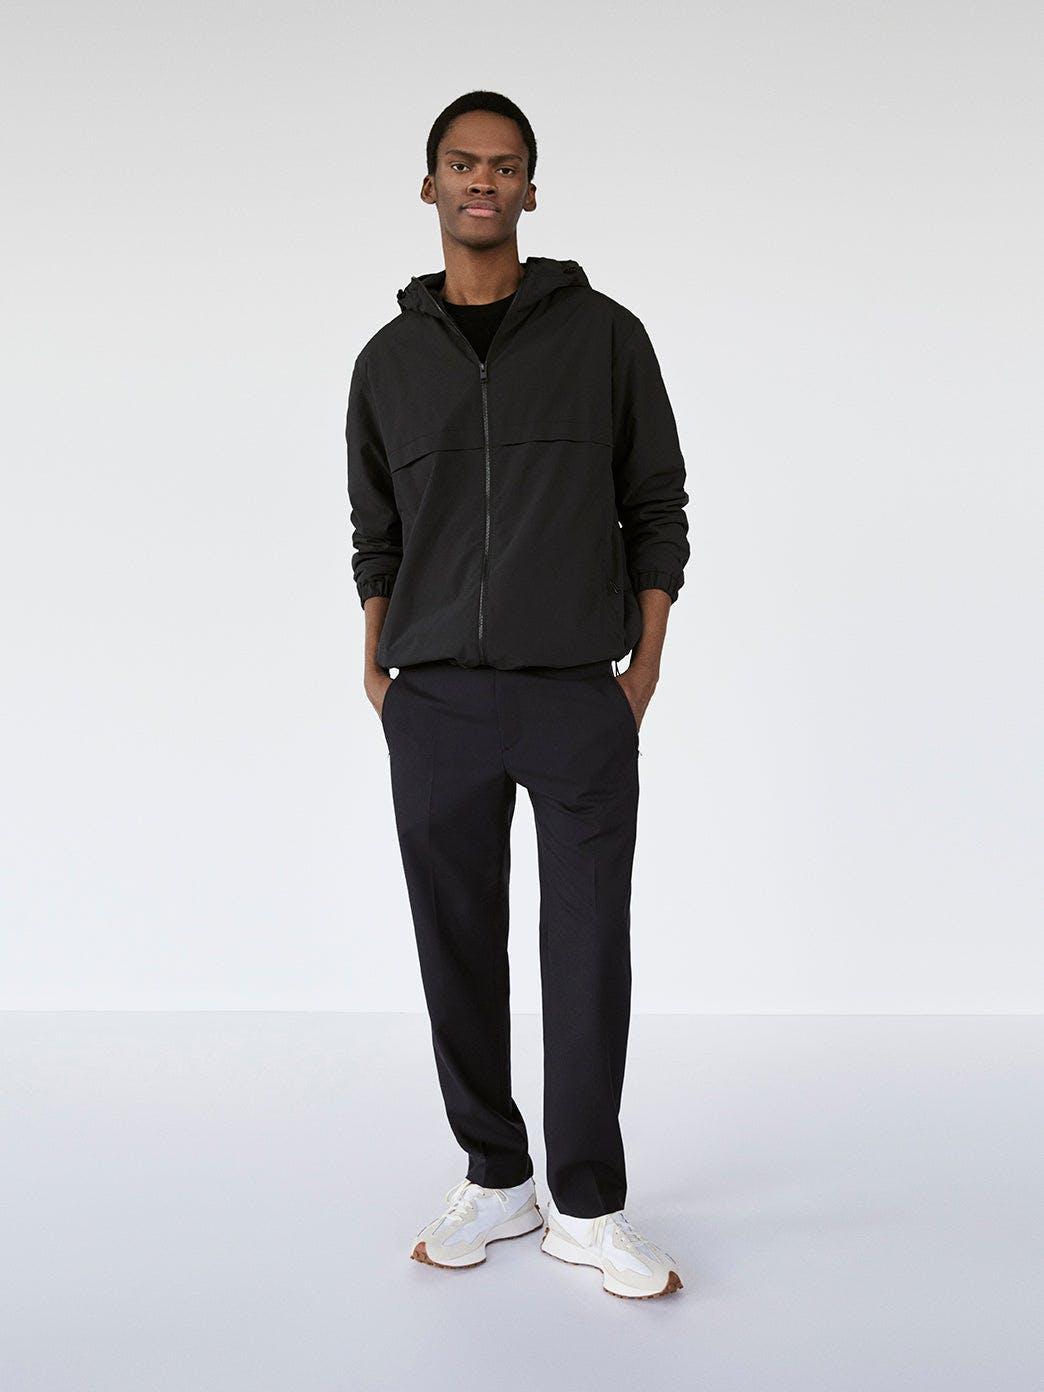 jacket full body view